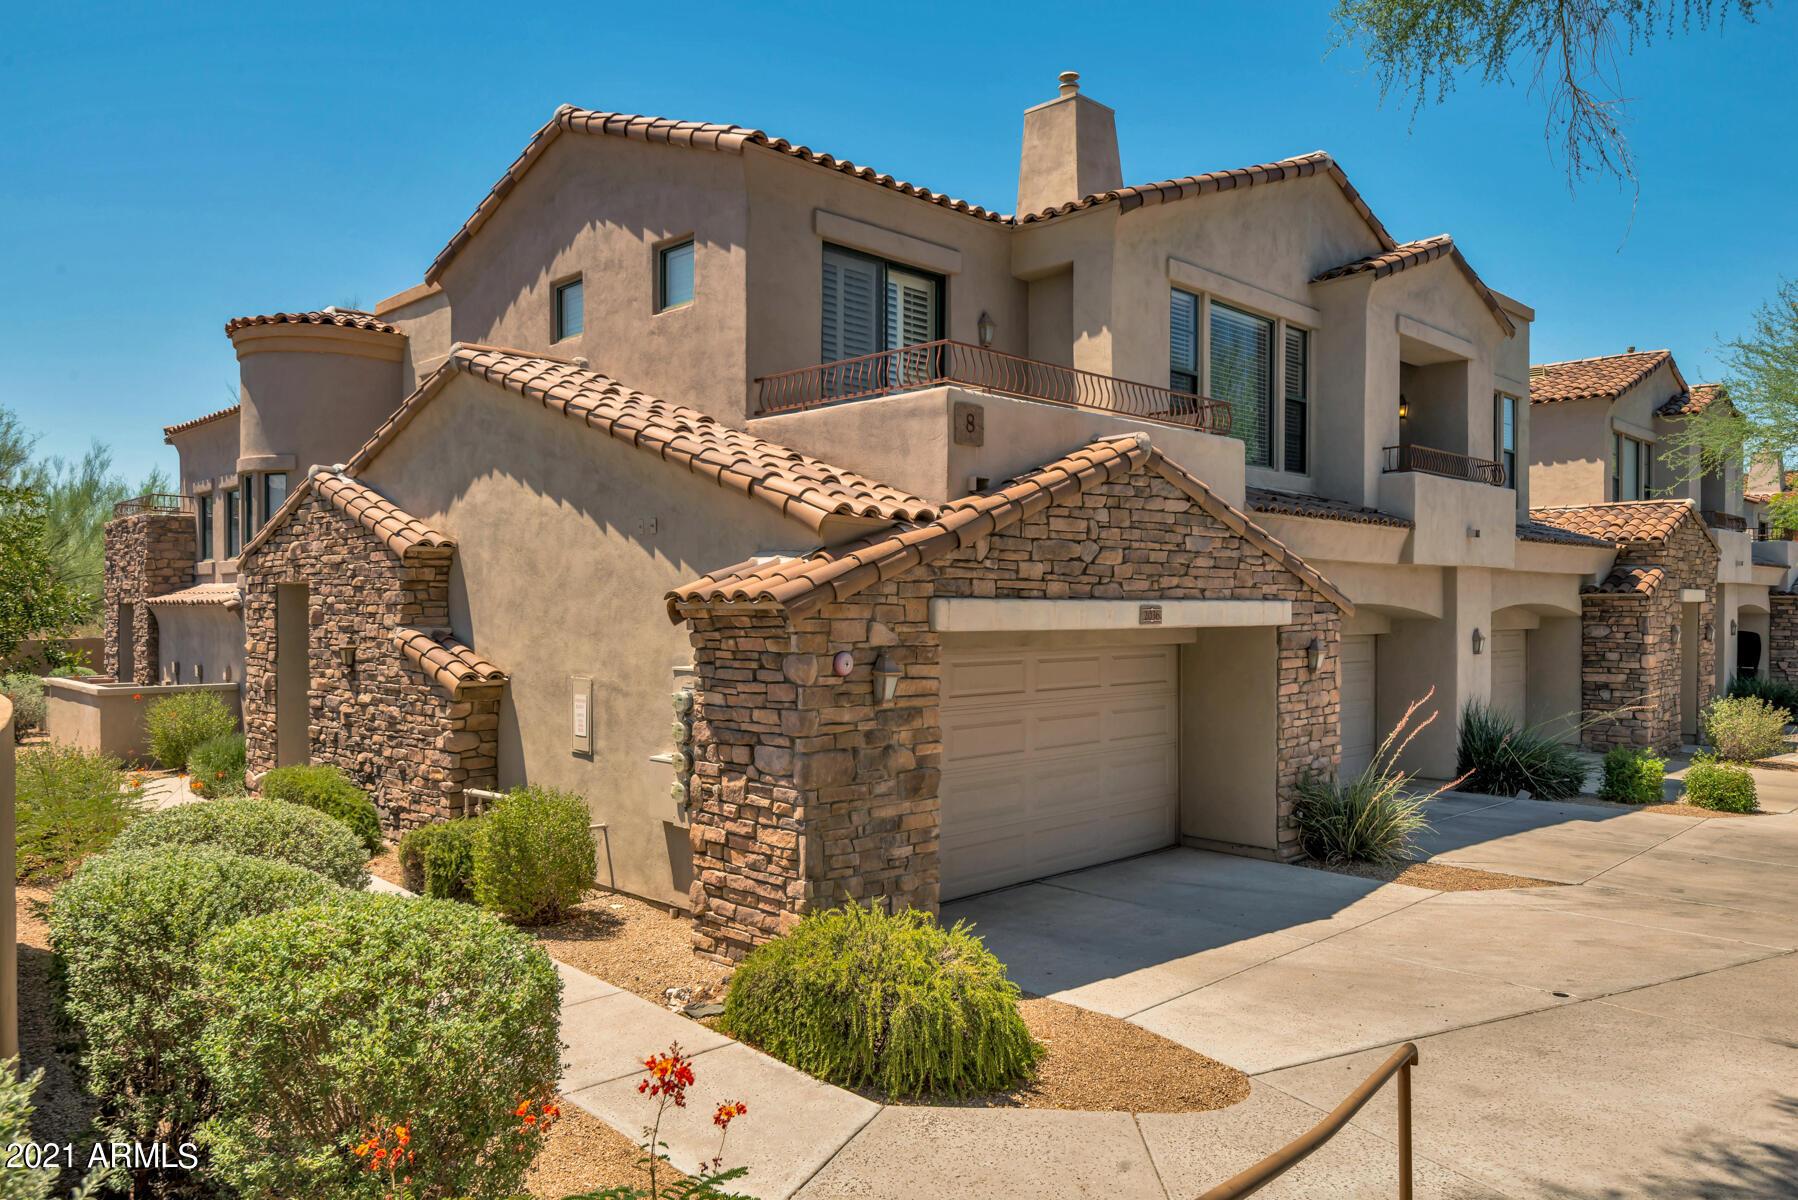 19550 N GRAYHAWK Drive # 2036, Scottsdale, AZ 85255, 2 Bedrooms Bedrooms, ,Residential Lease,For Rent,19550 N GRAYHAWK Drive # 2036,6132090